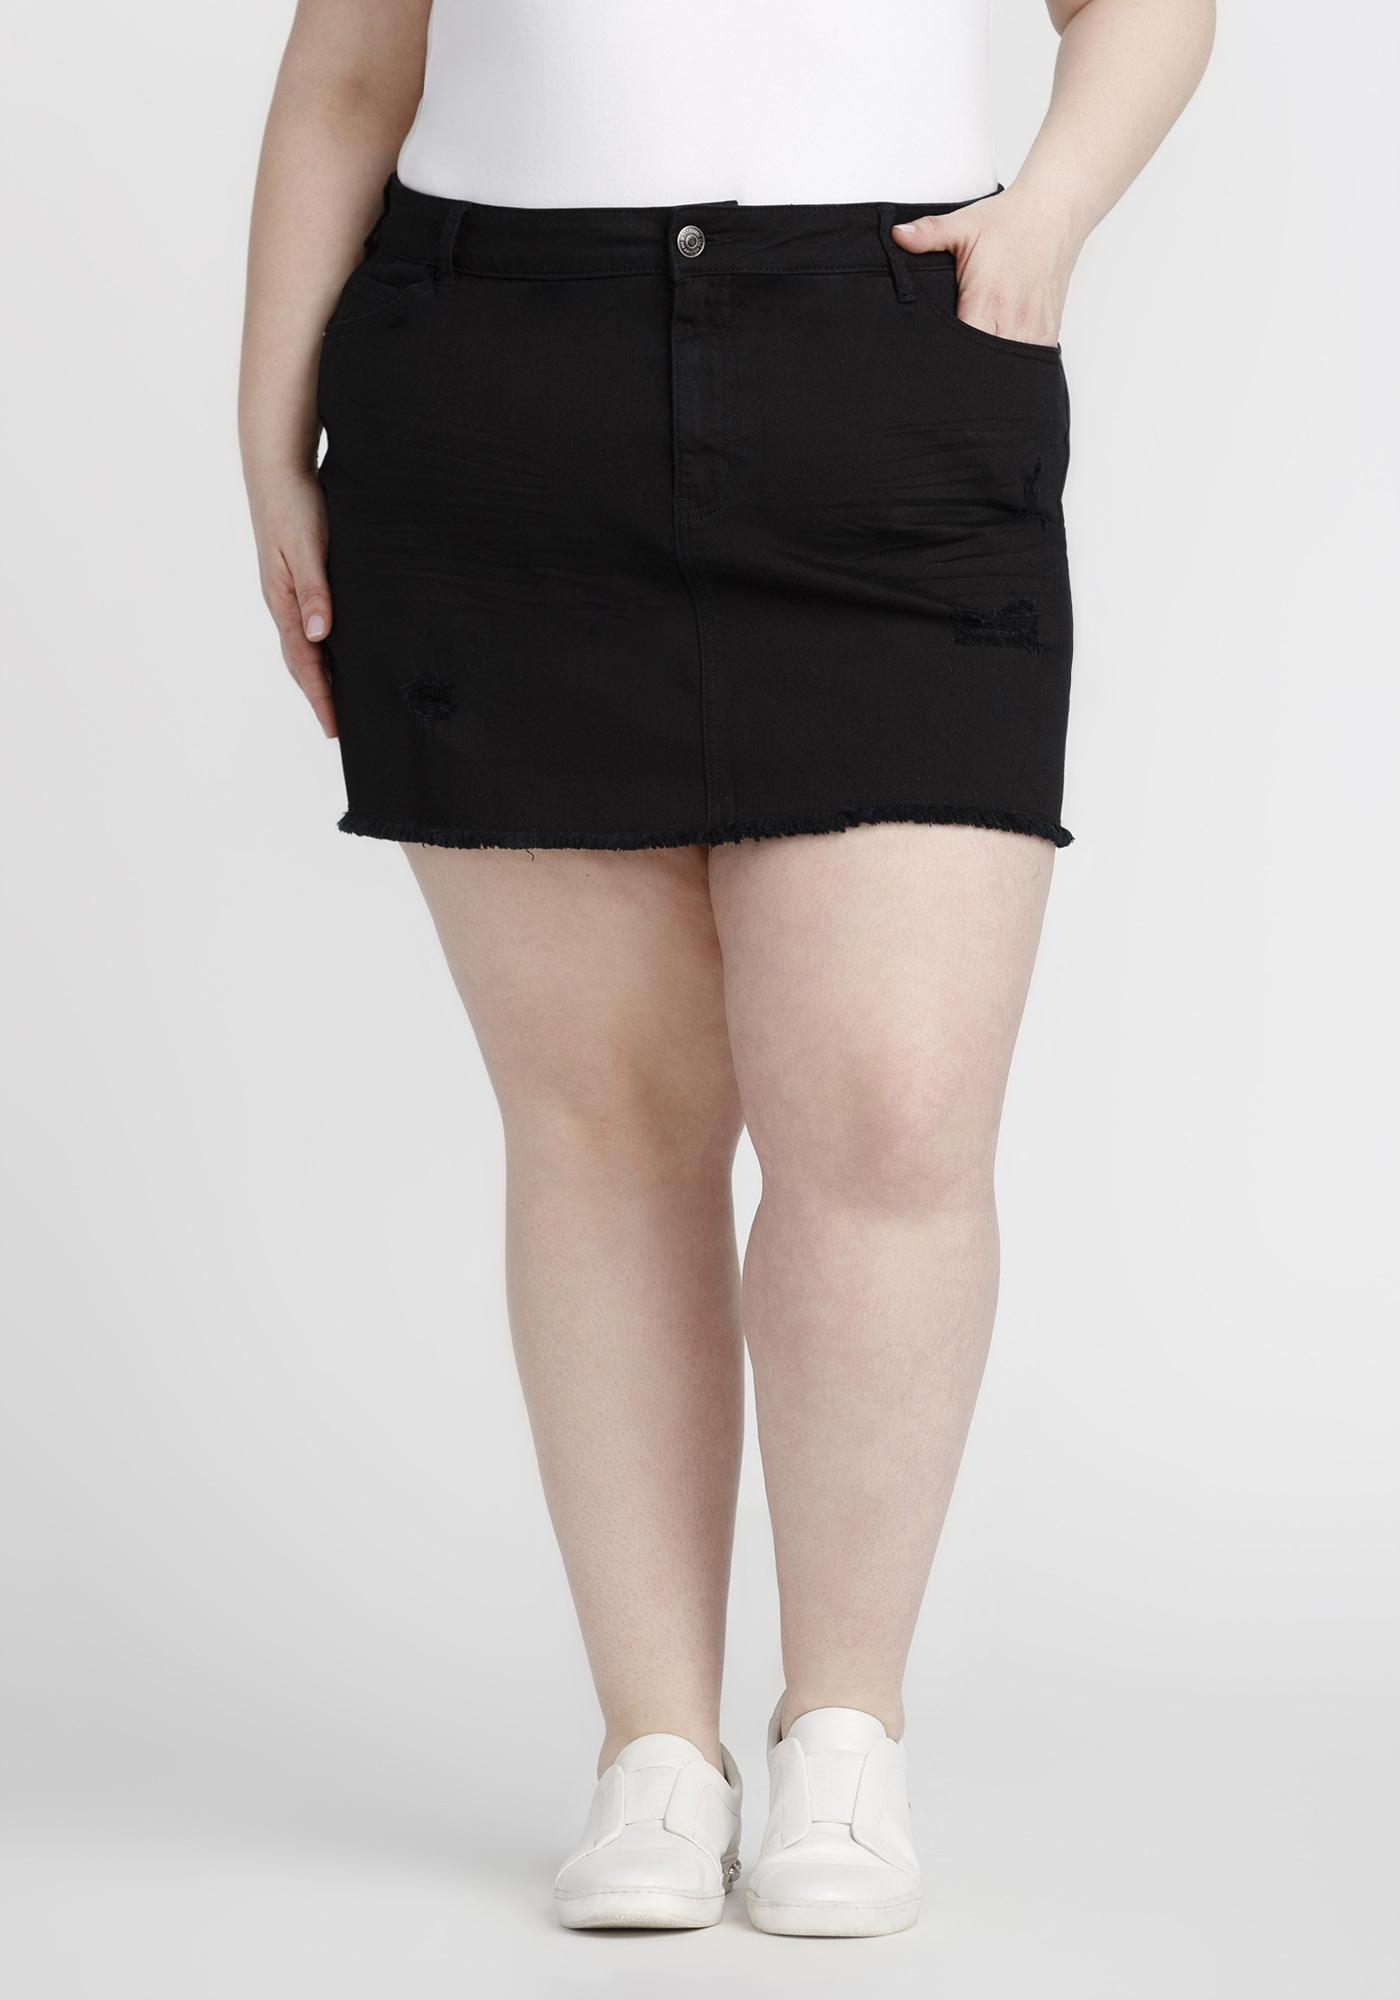 60a05f7fd0ffa Imágenes de Plus Size Denim Skirt Black